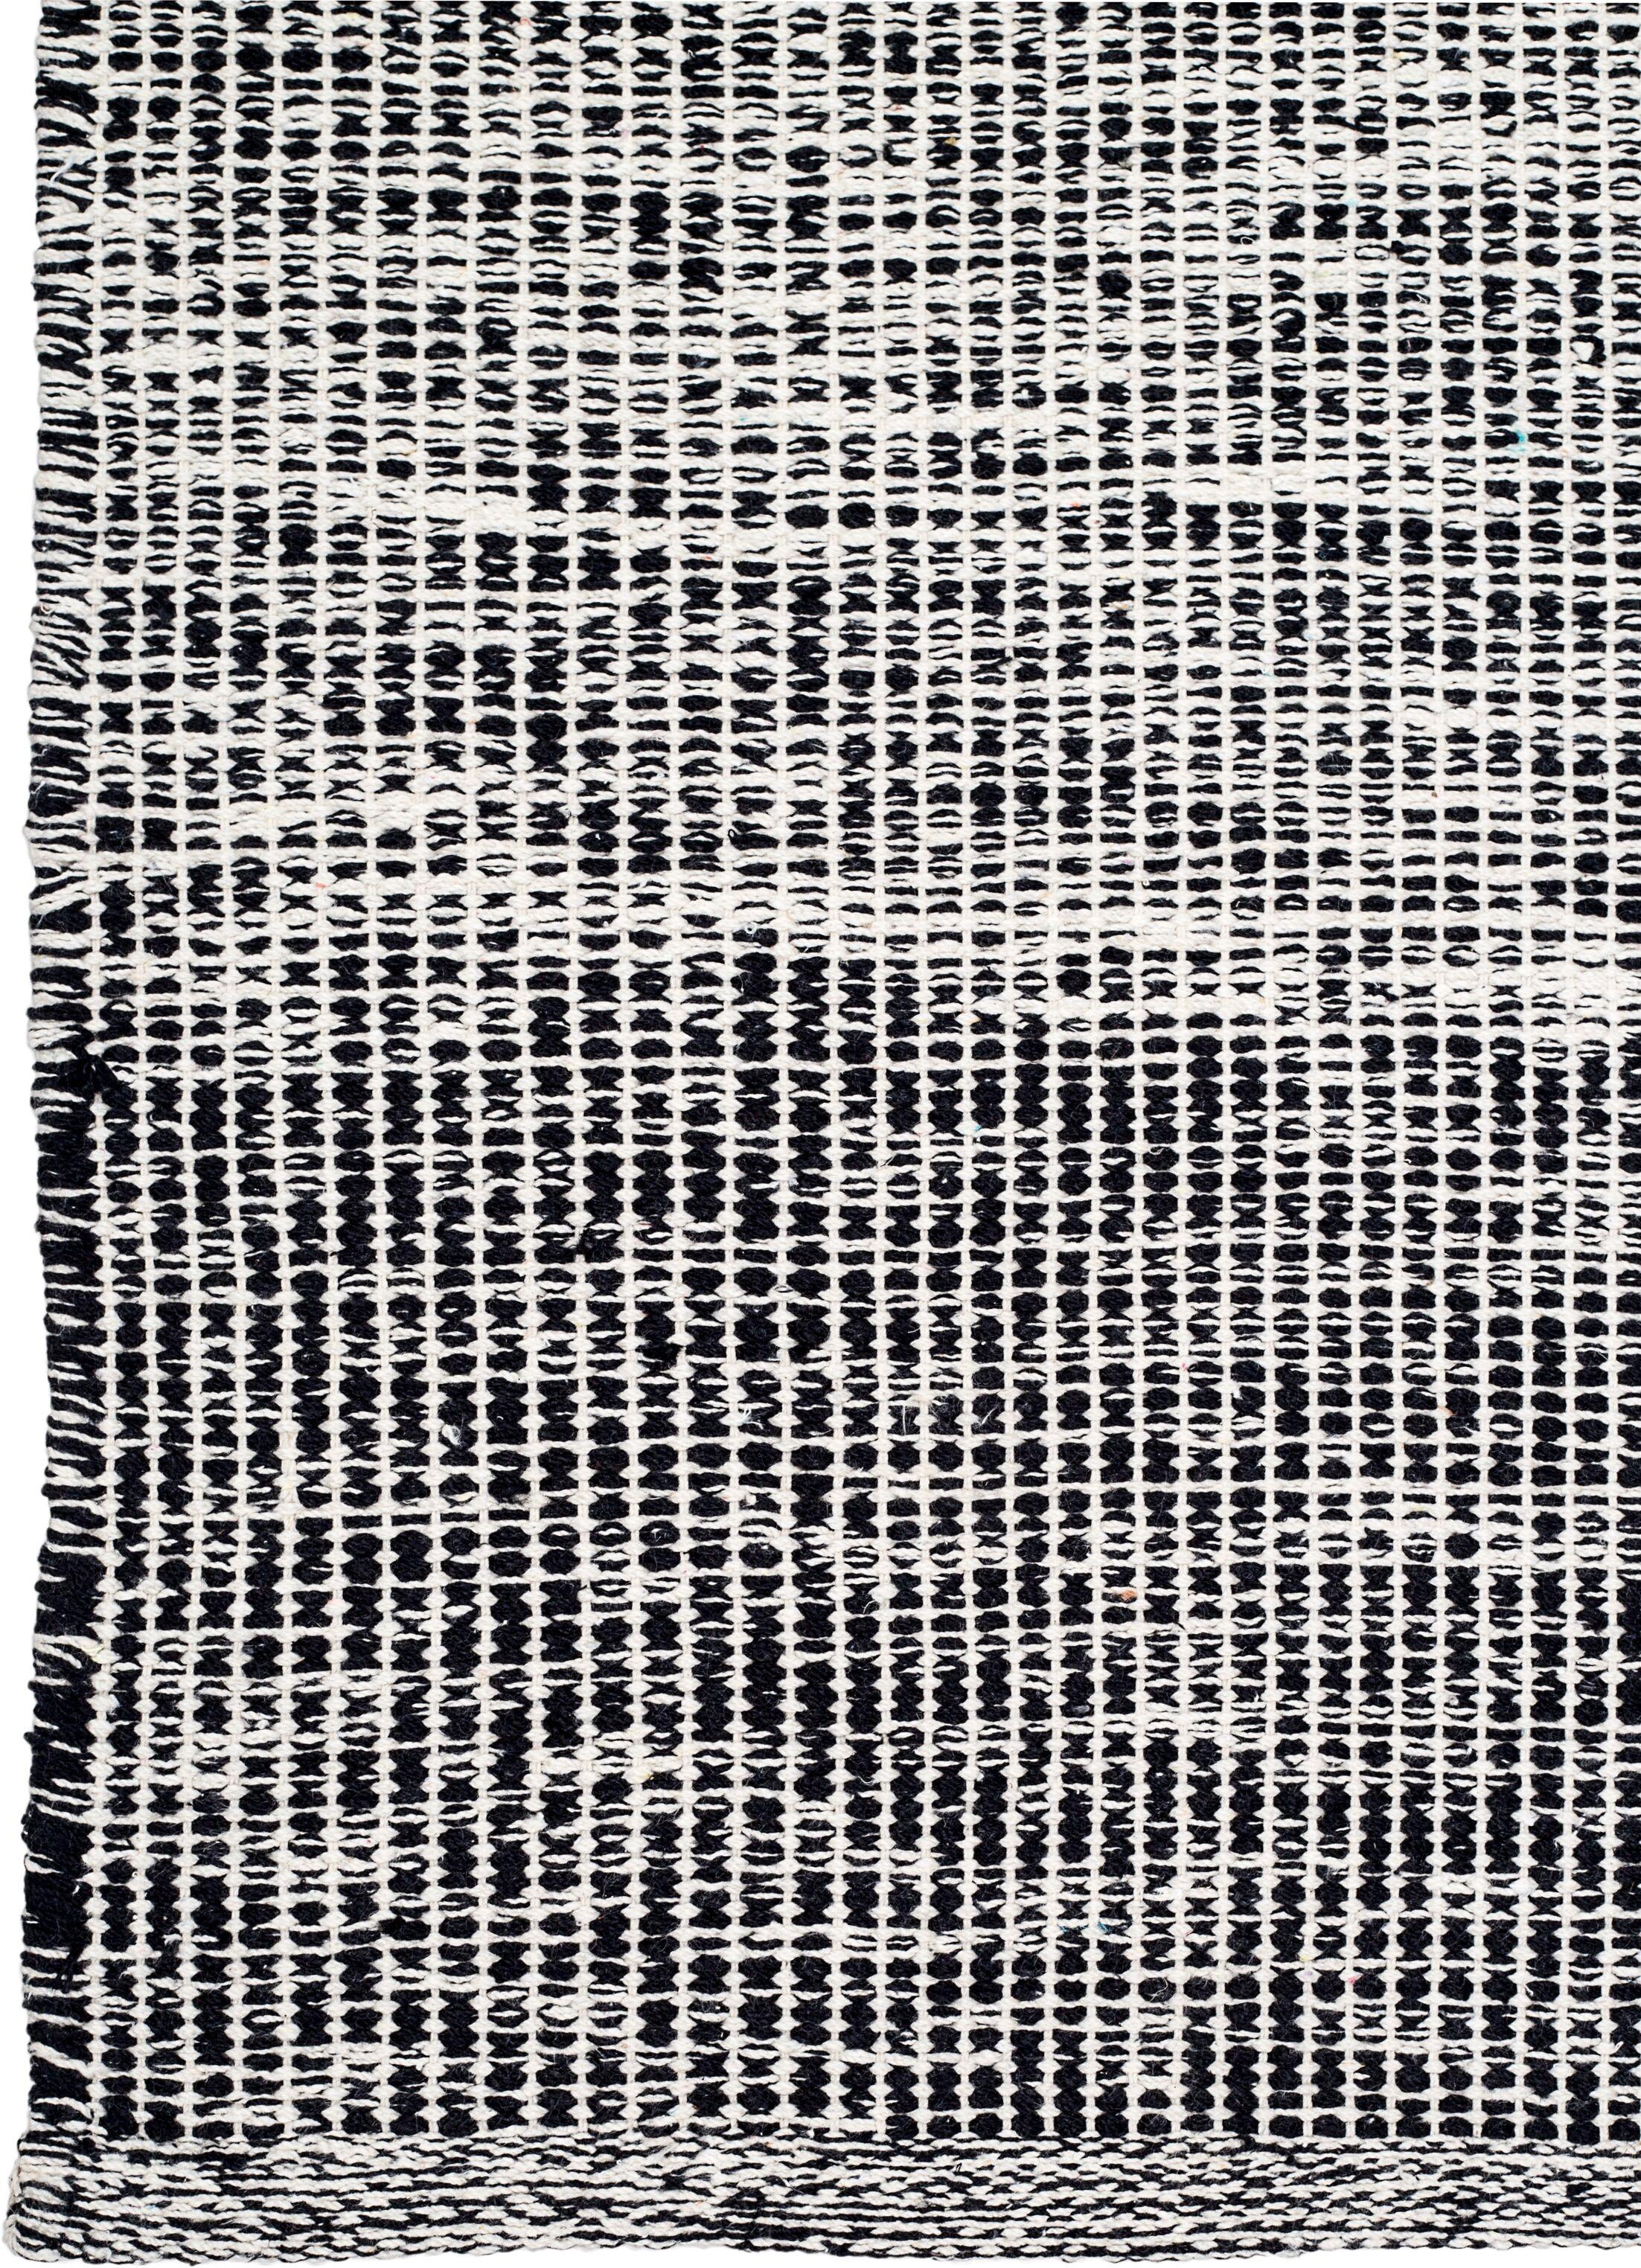 Zen Hand-Woven Black/Gray Area Rug Rug Size: 5' x 8'